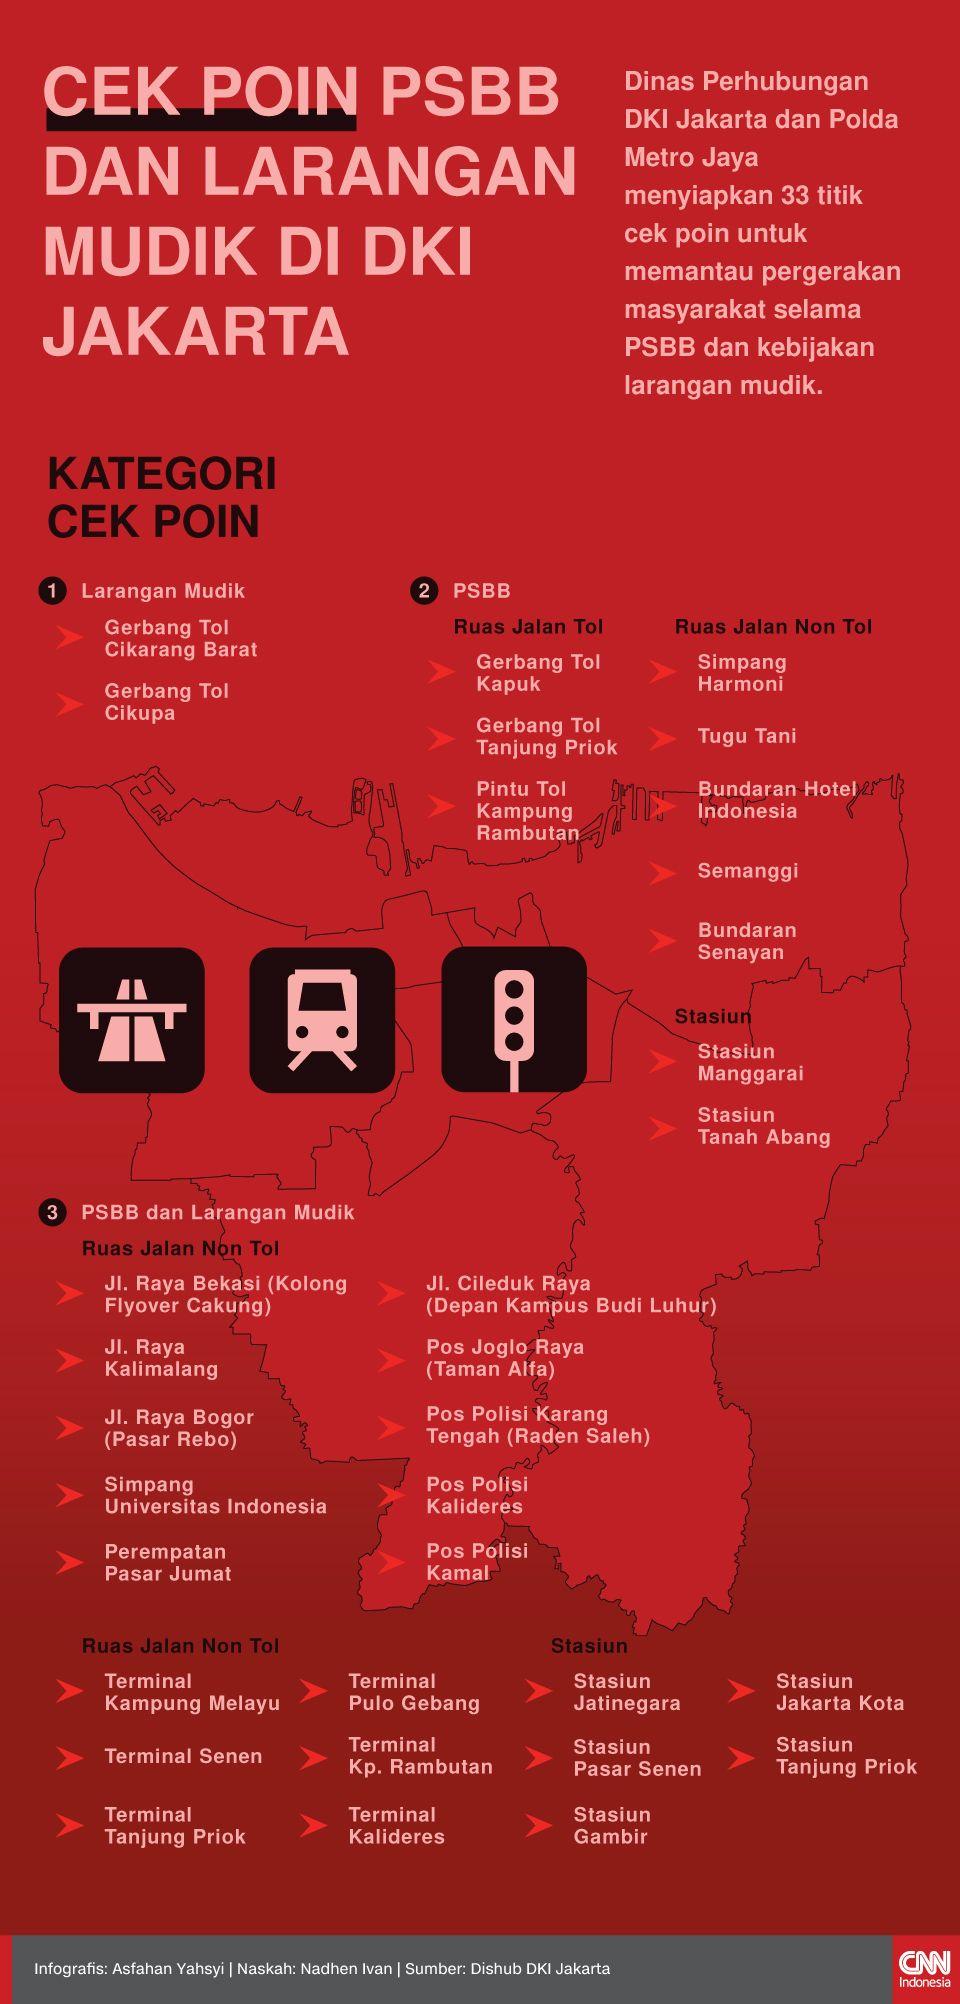 Infografis Cek Poin PSBB dan Larangan Mudik di DKI Jakarta